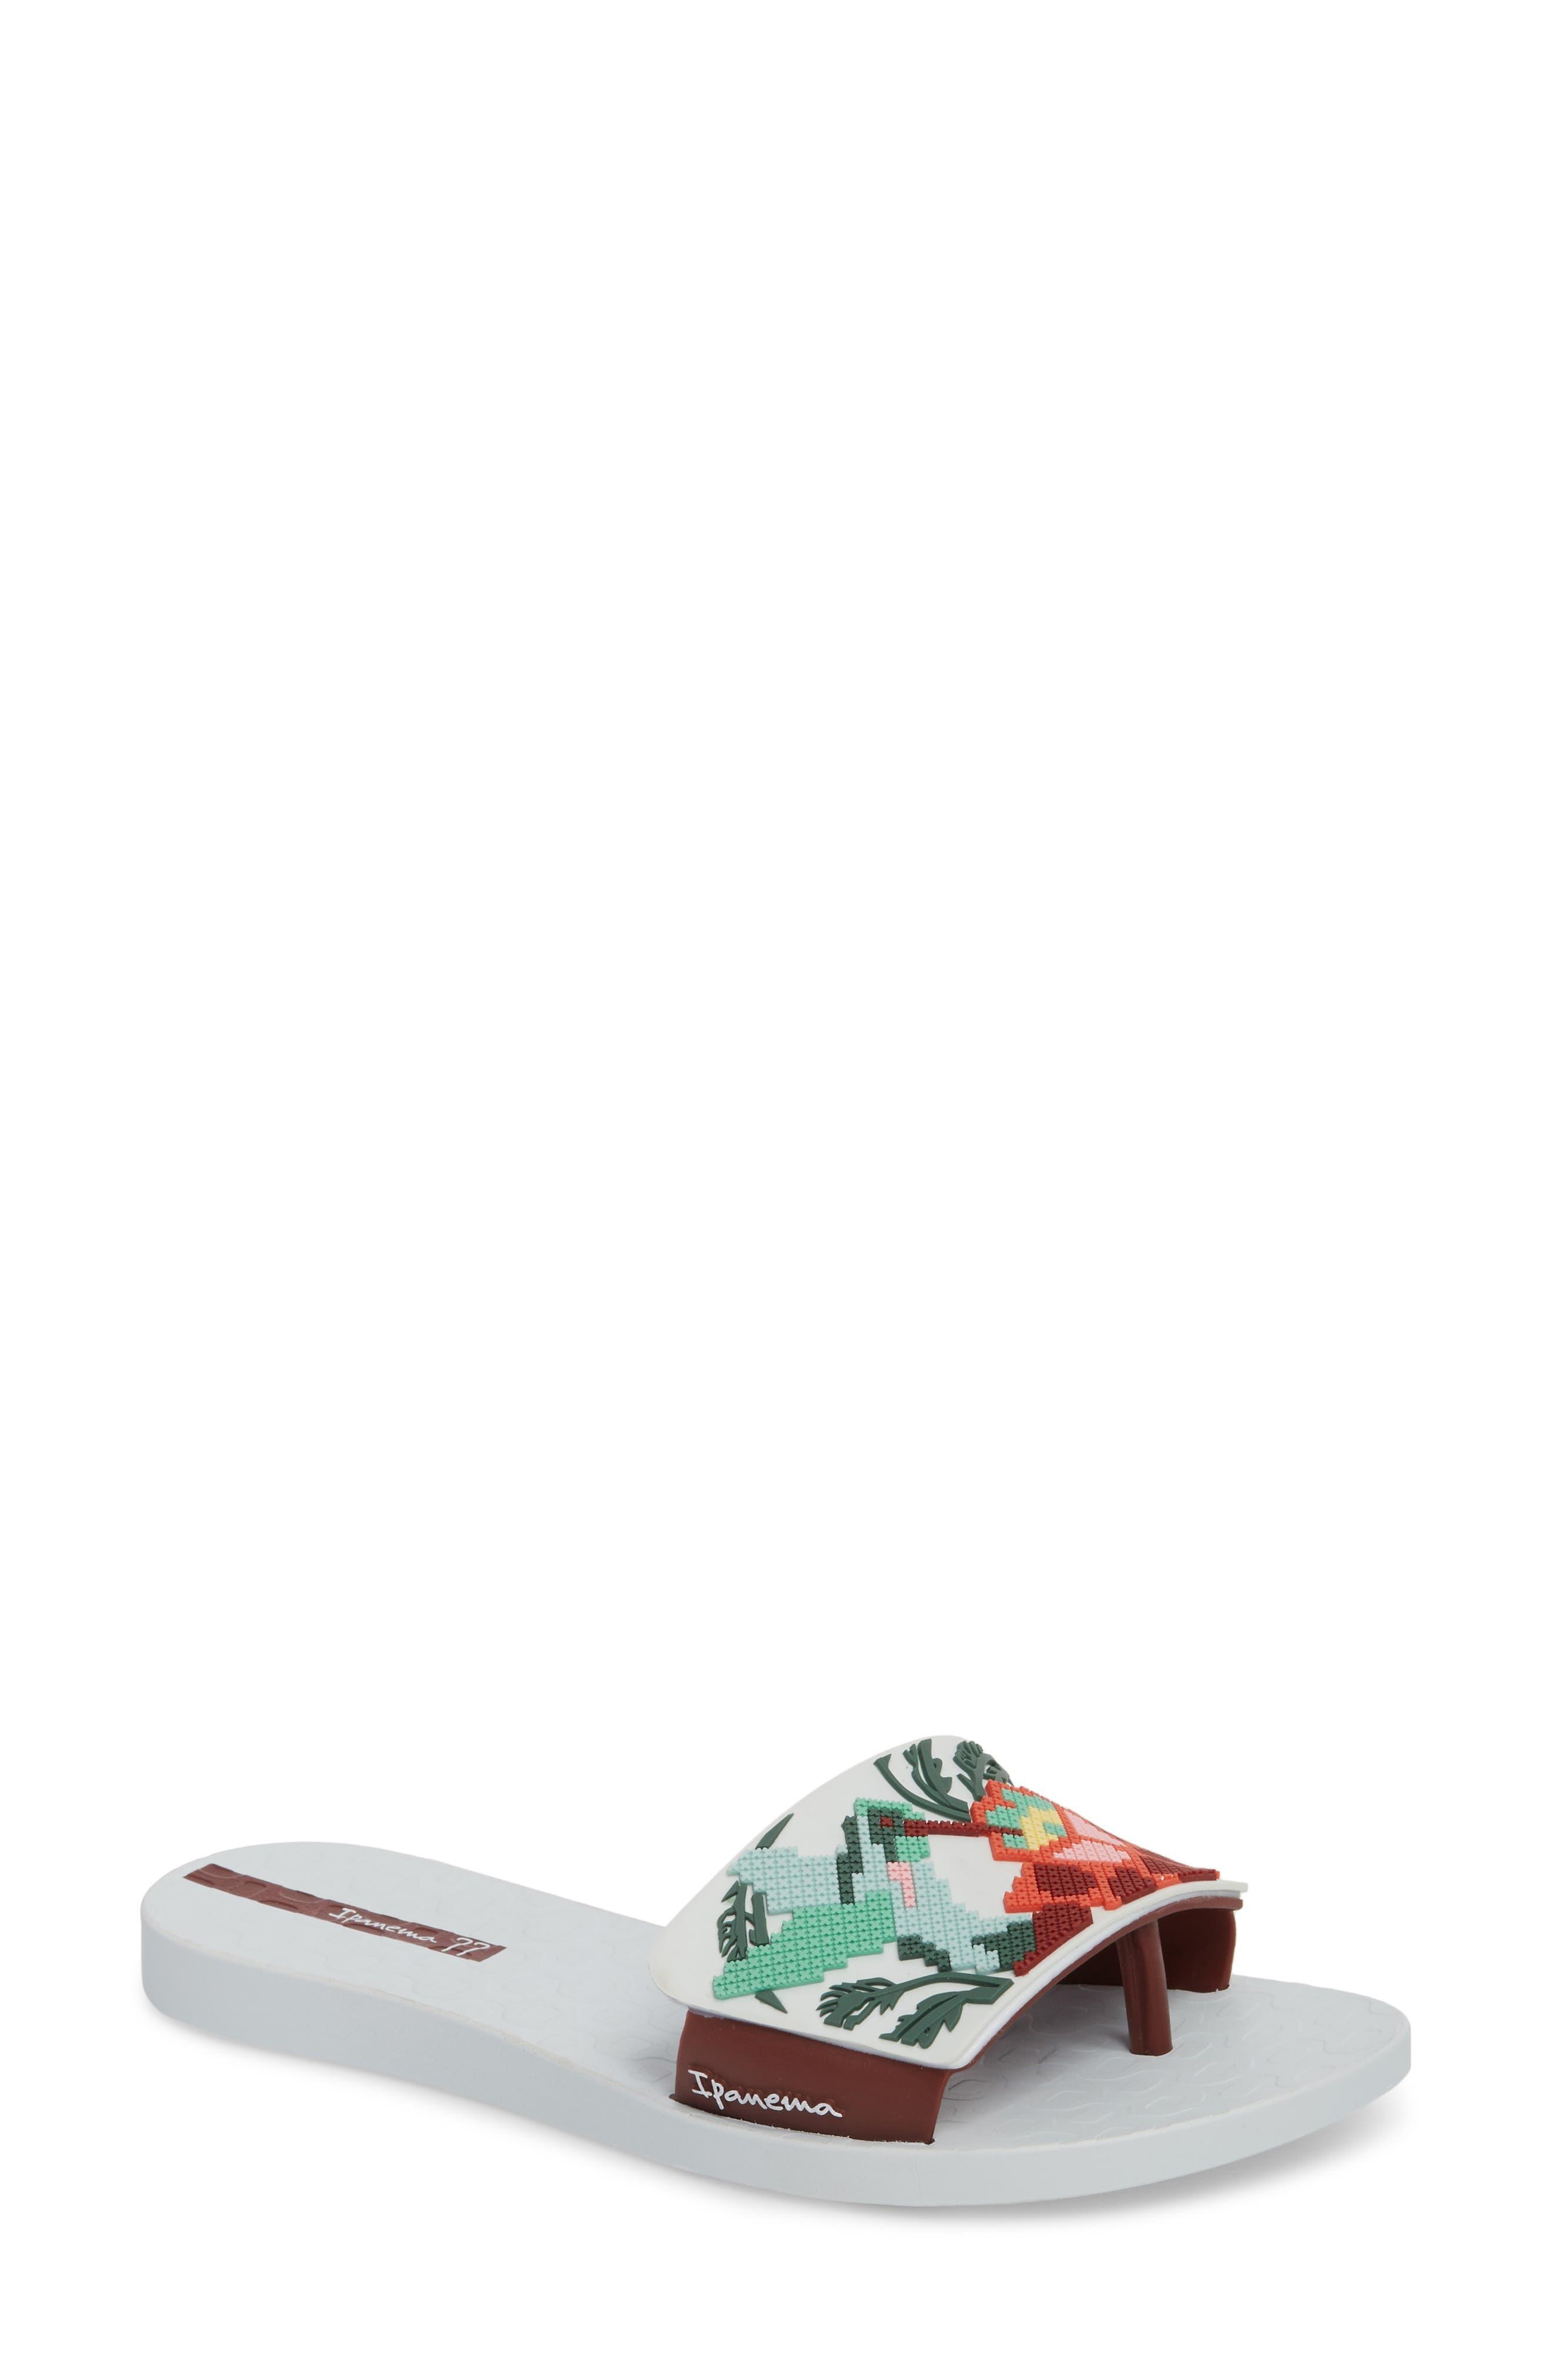 IPANEMA Nectar Floral Slide Sandal, White/ Burgundy